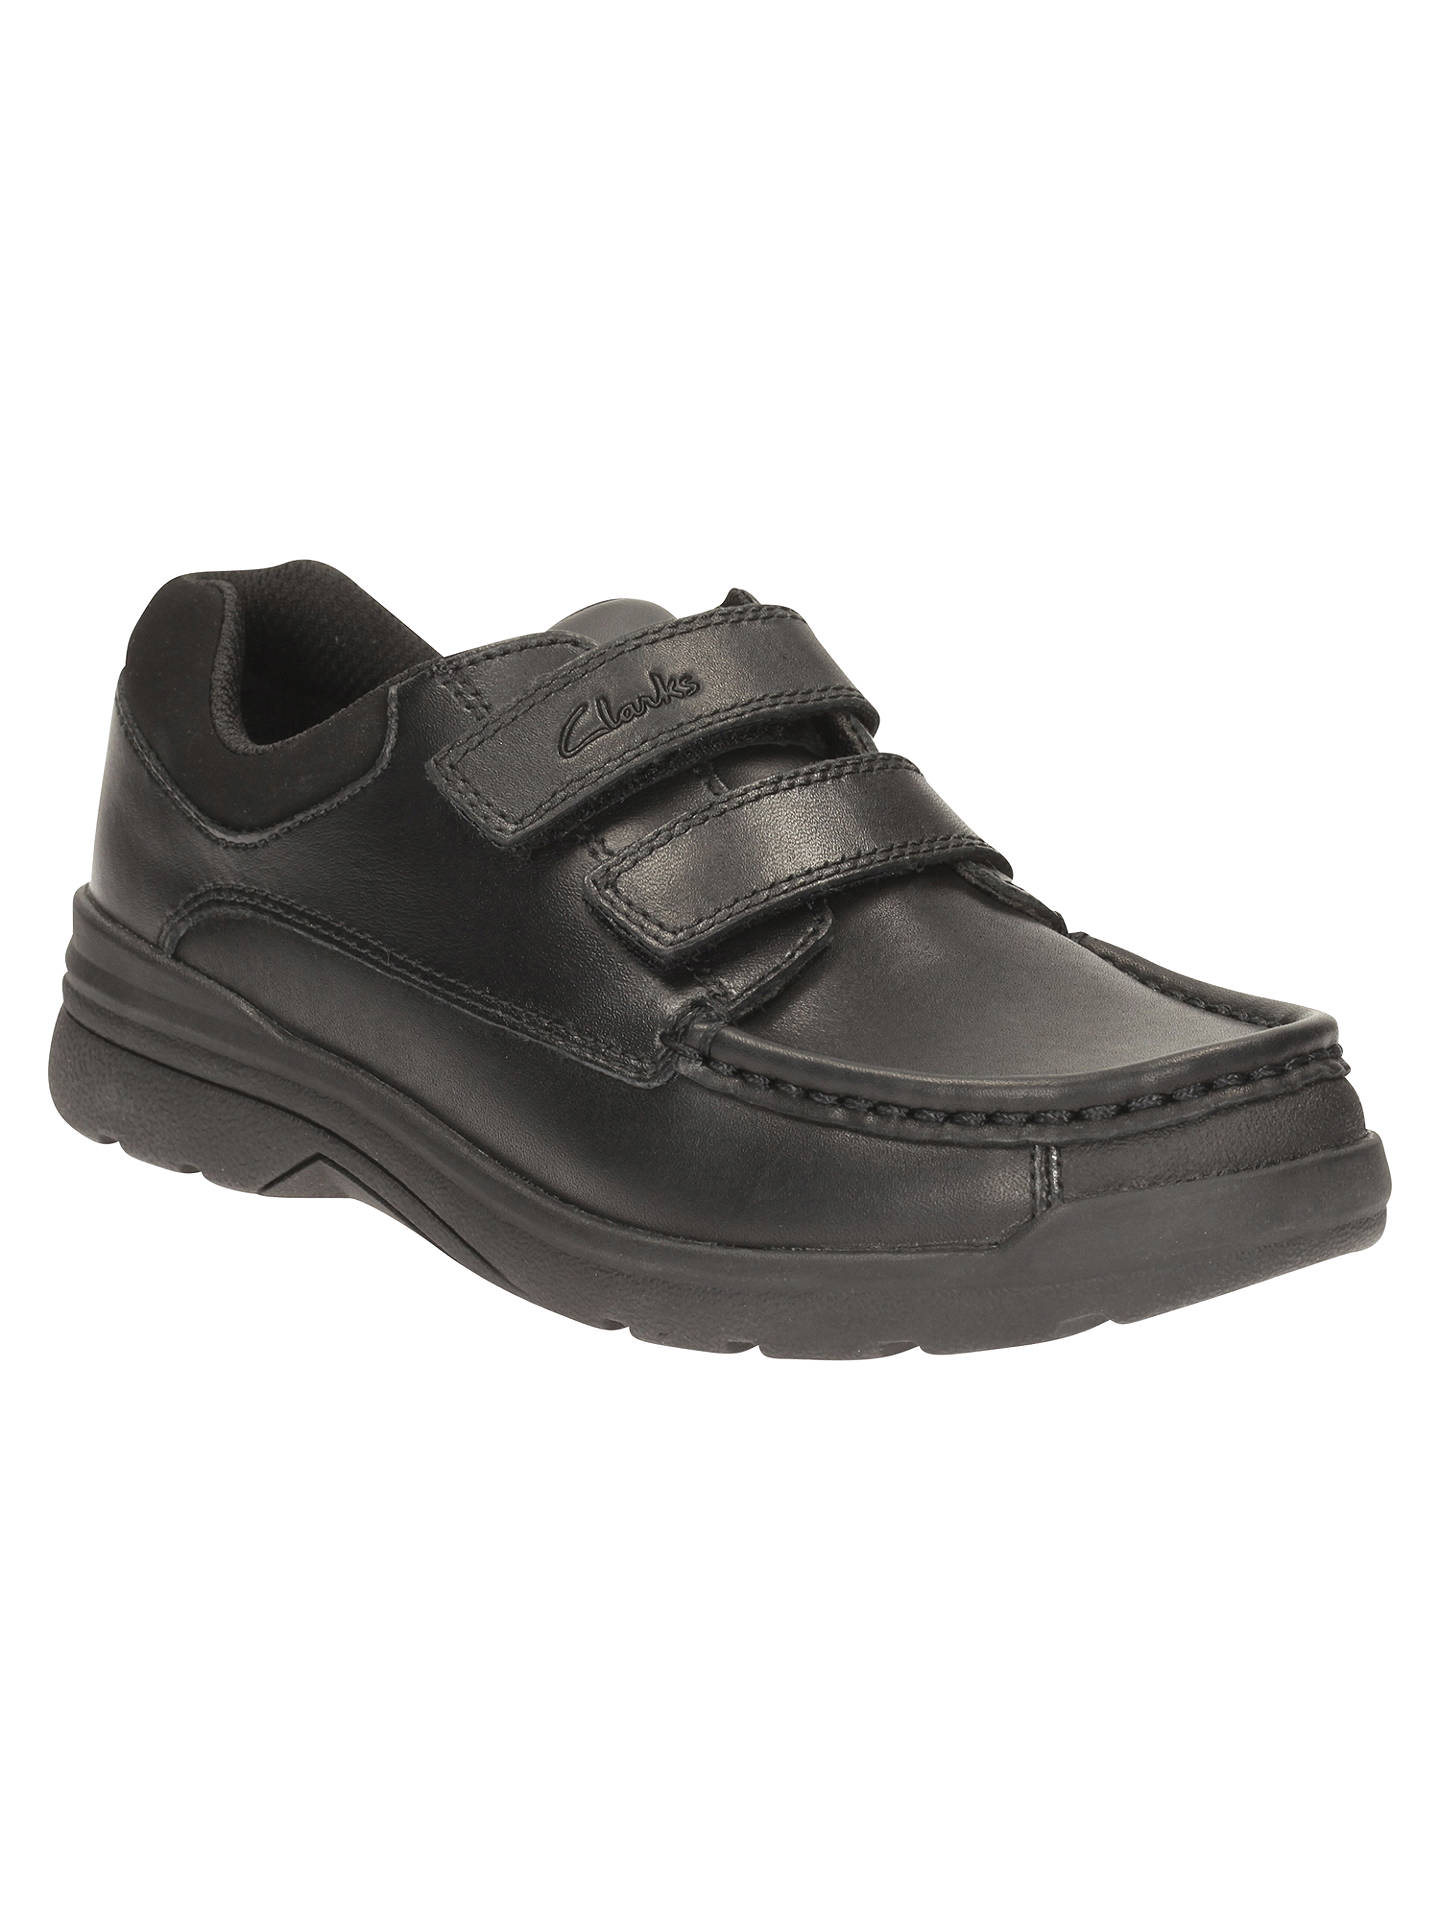 Clarks Boys School Shoes /'Obie Play/'